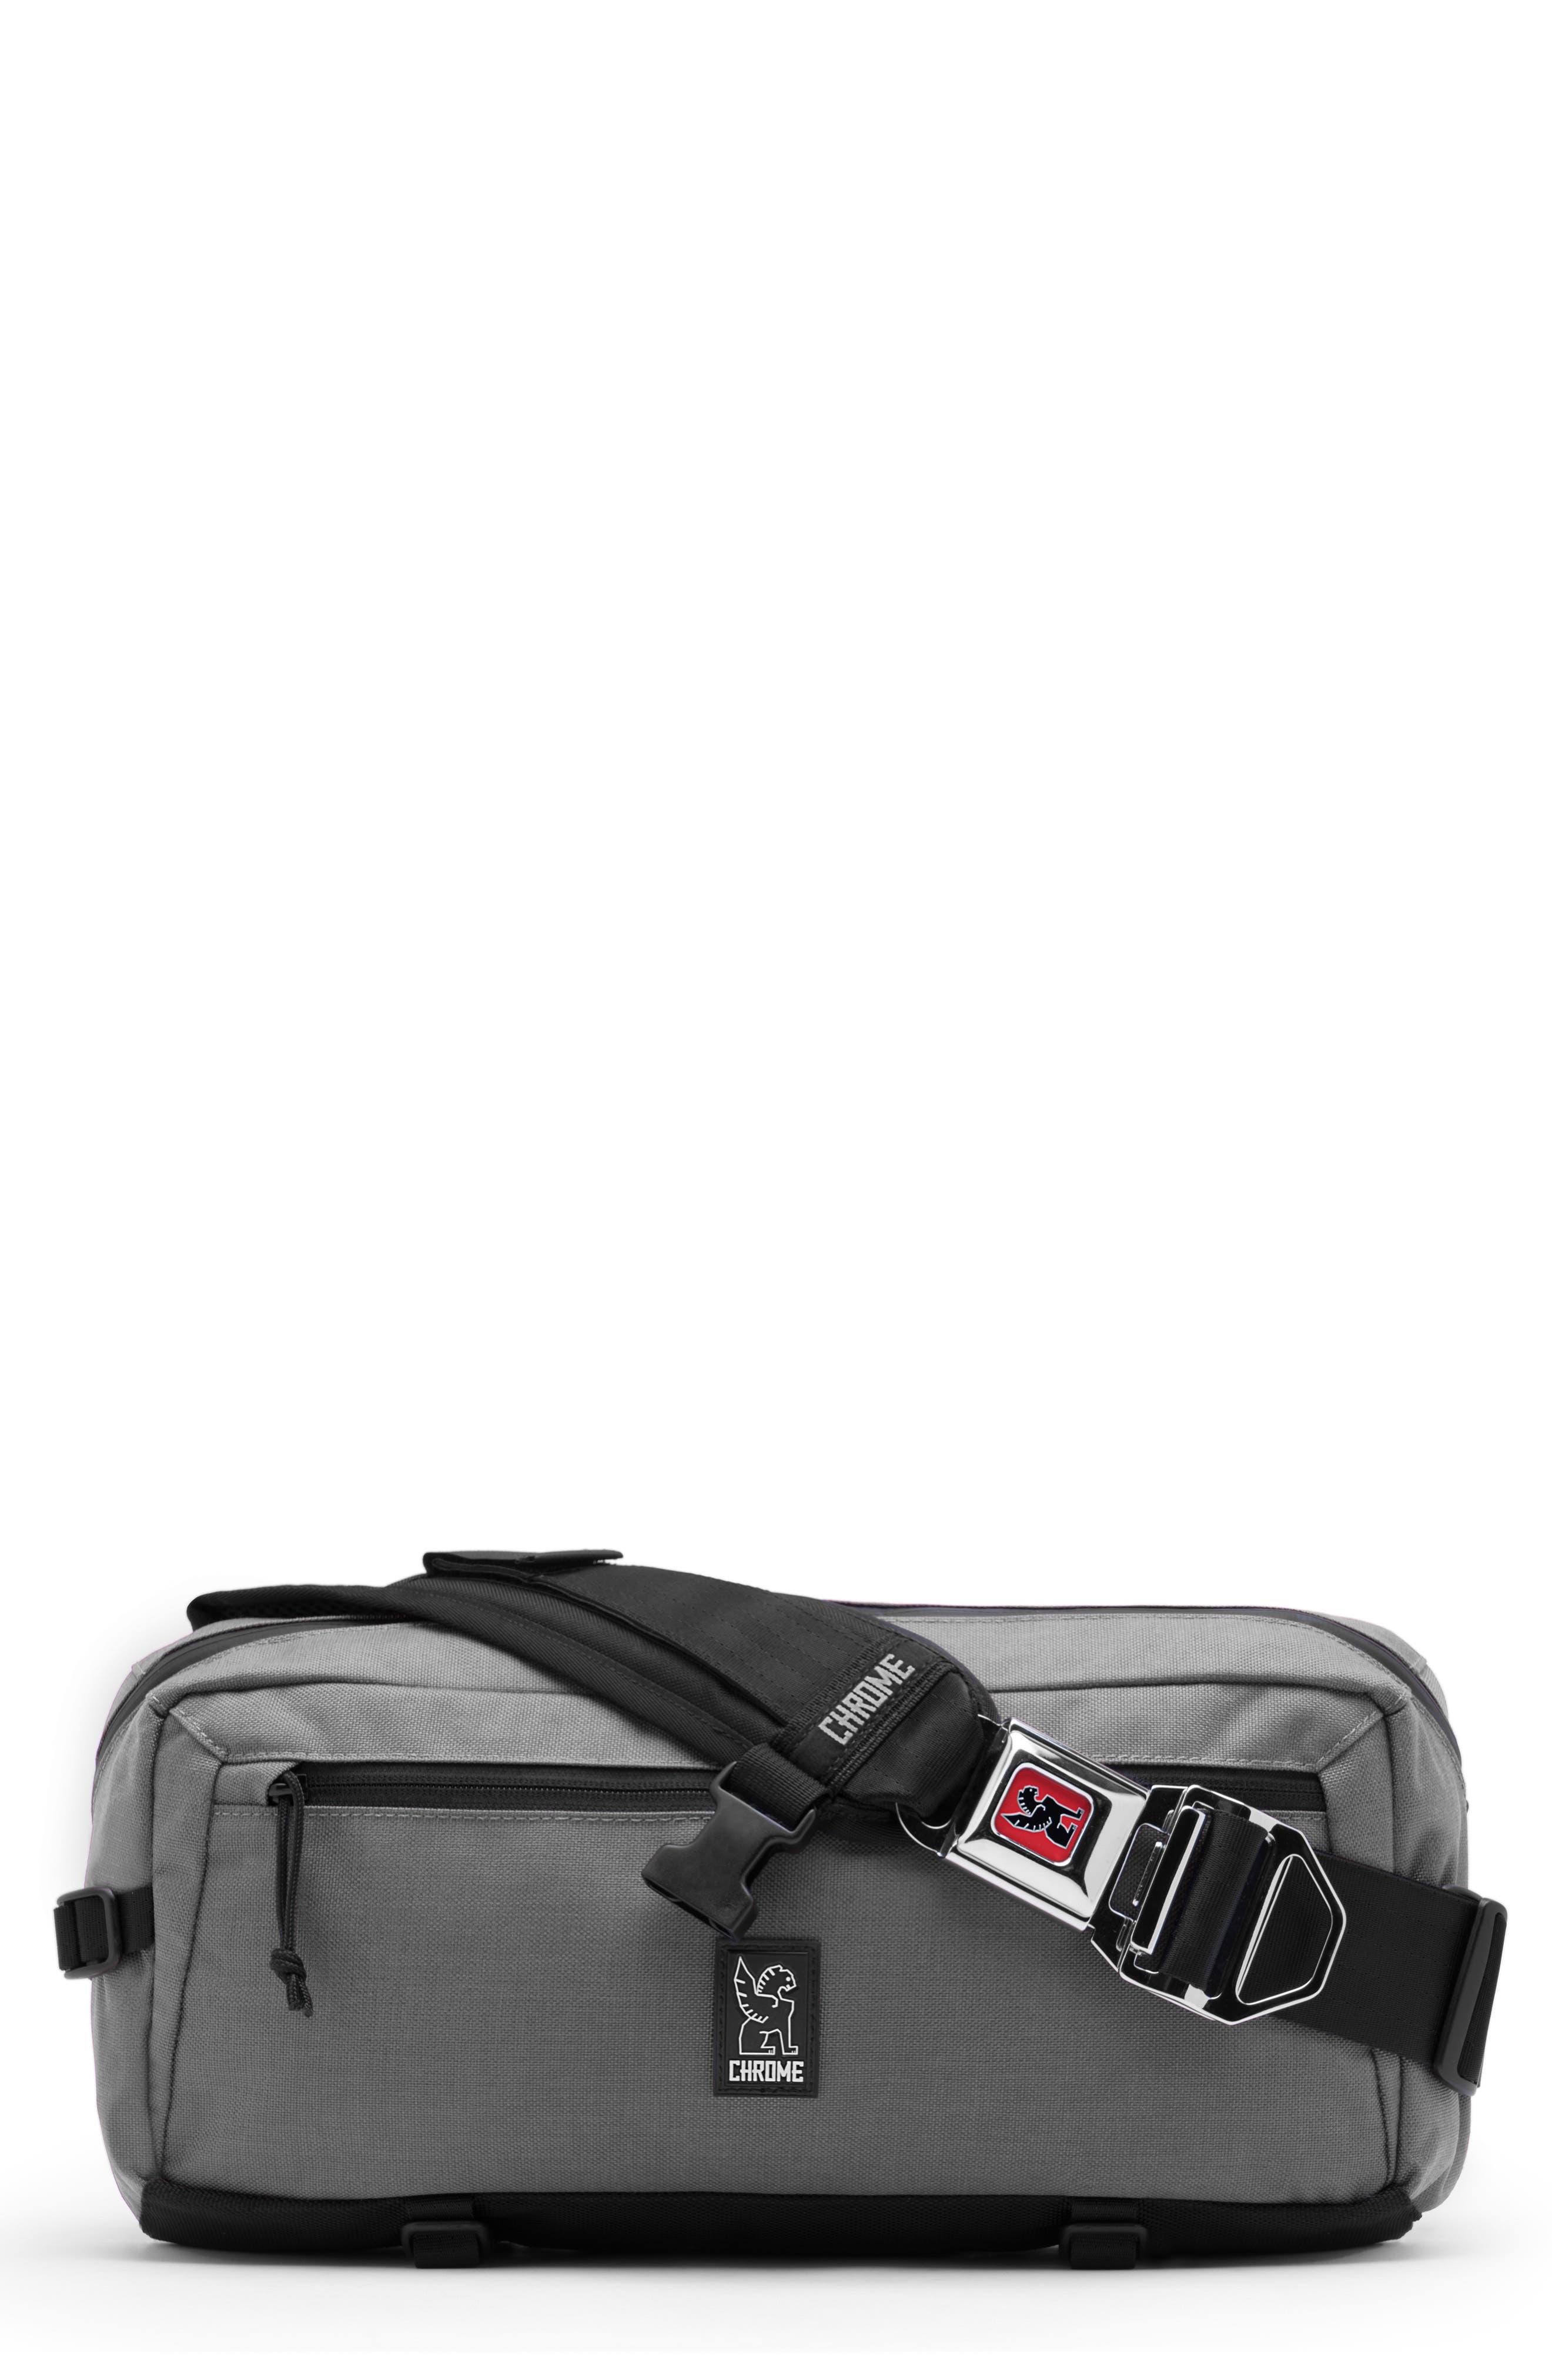 Kadet Messenger Bag,                         Main,                         color, GARGOYLE GREY